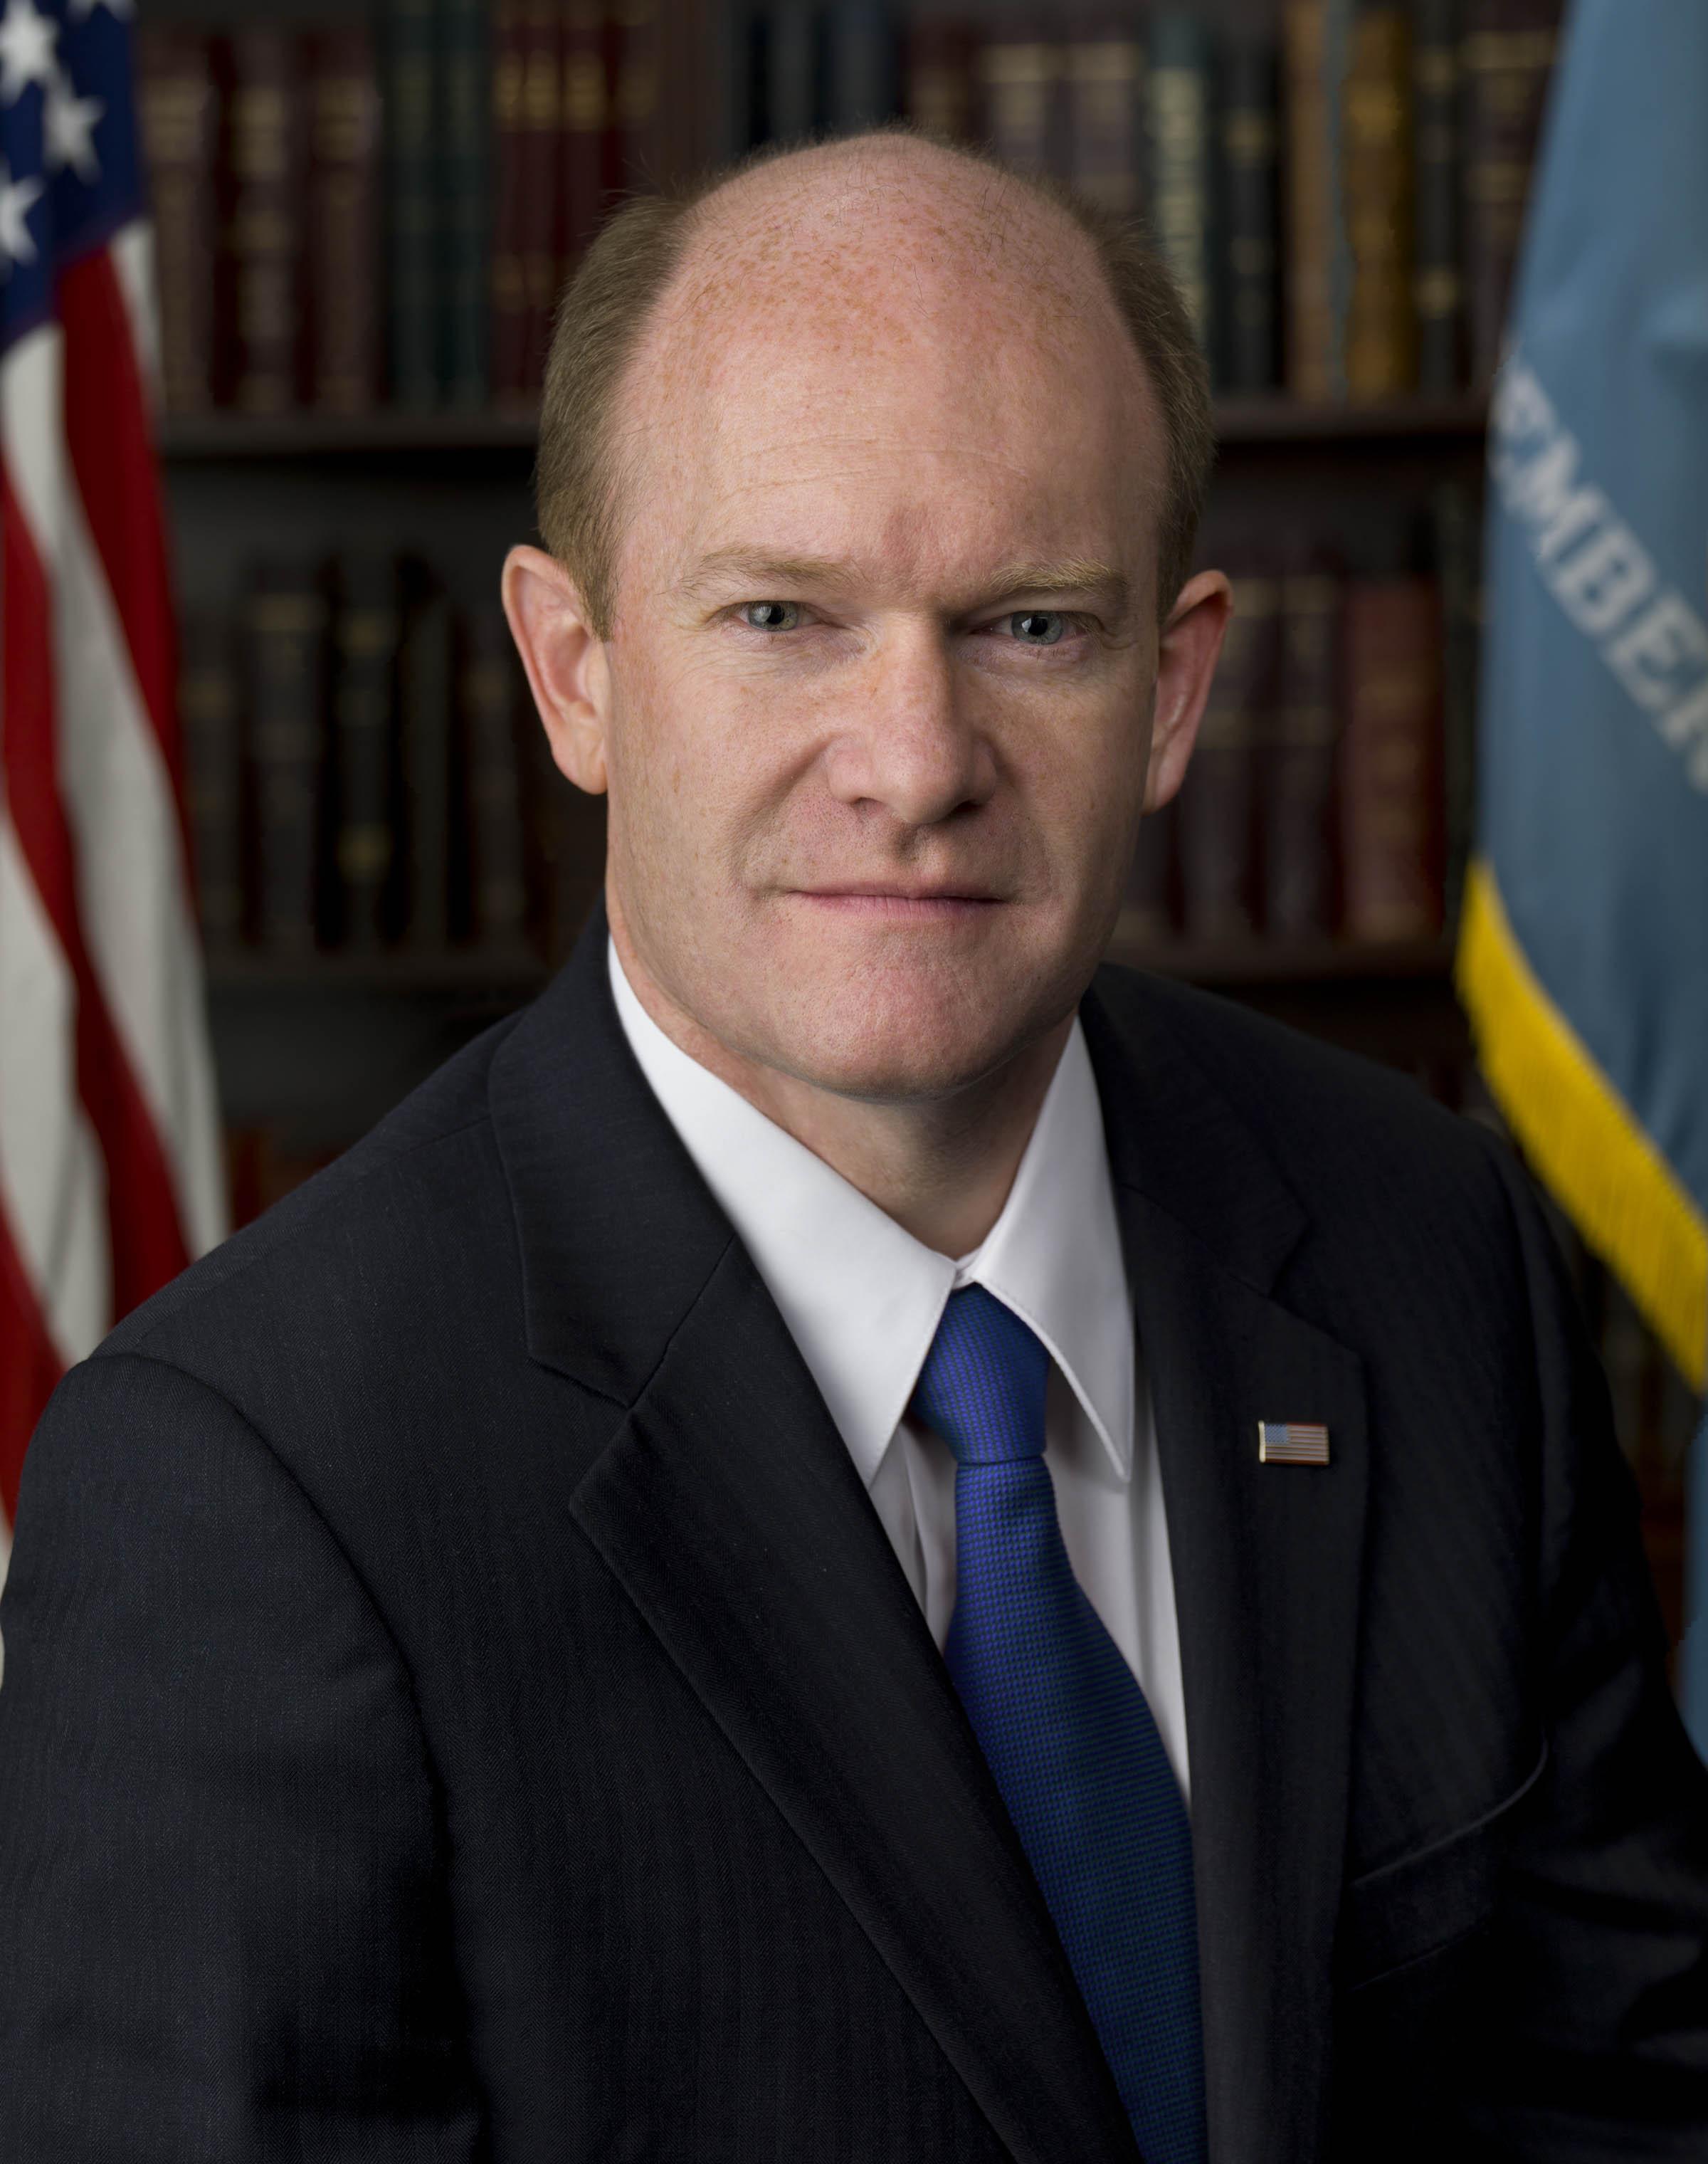 Sen. Christopher Coons (D-DE)